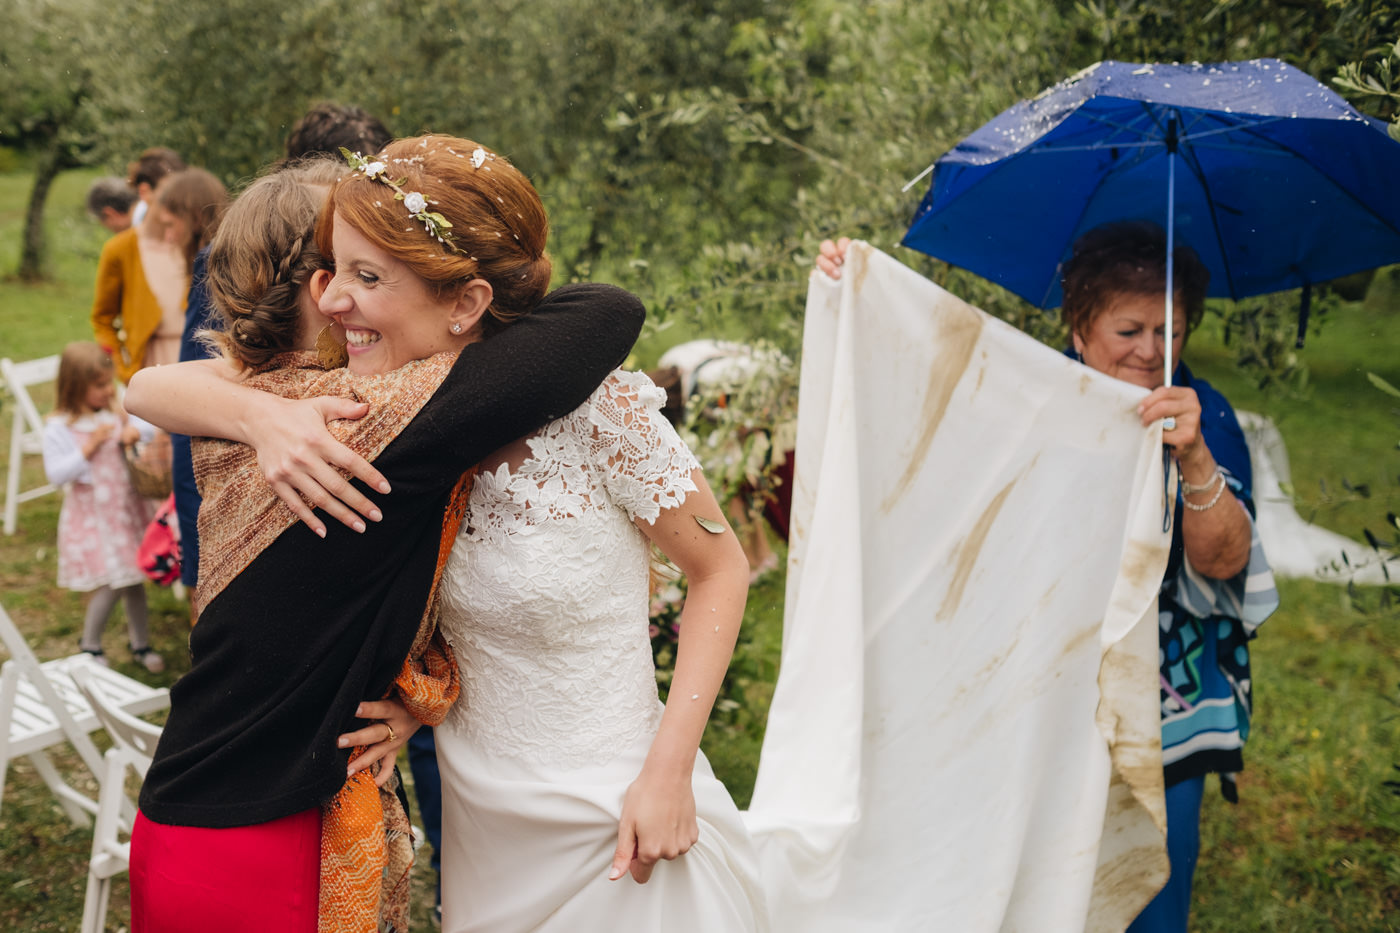 matrimoni_all_italiana_fotografo_matrimonio_toscana-47.jpg